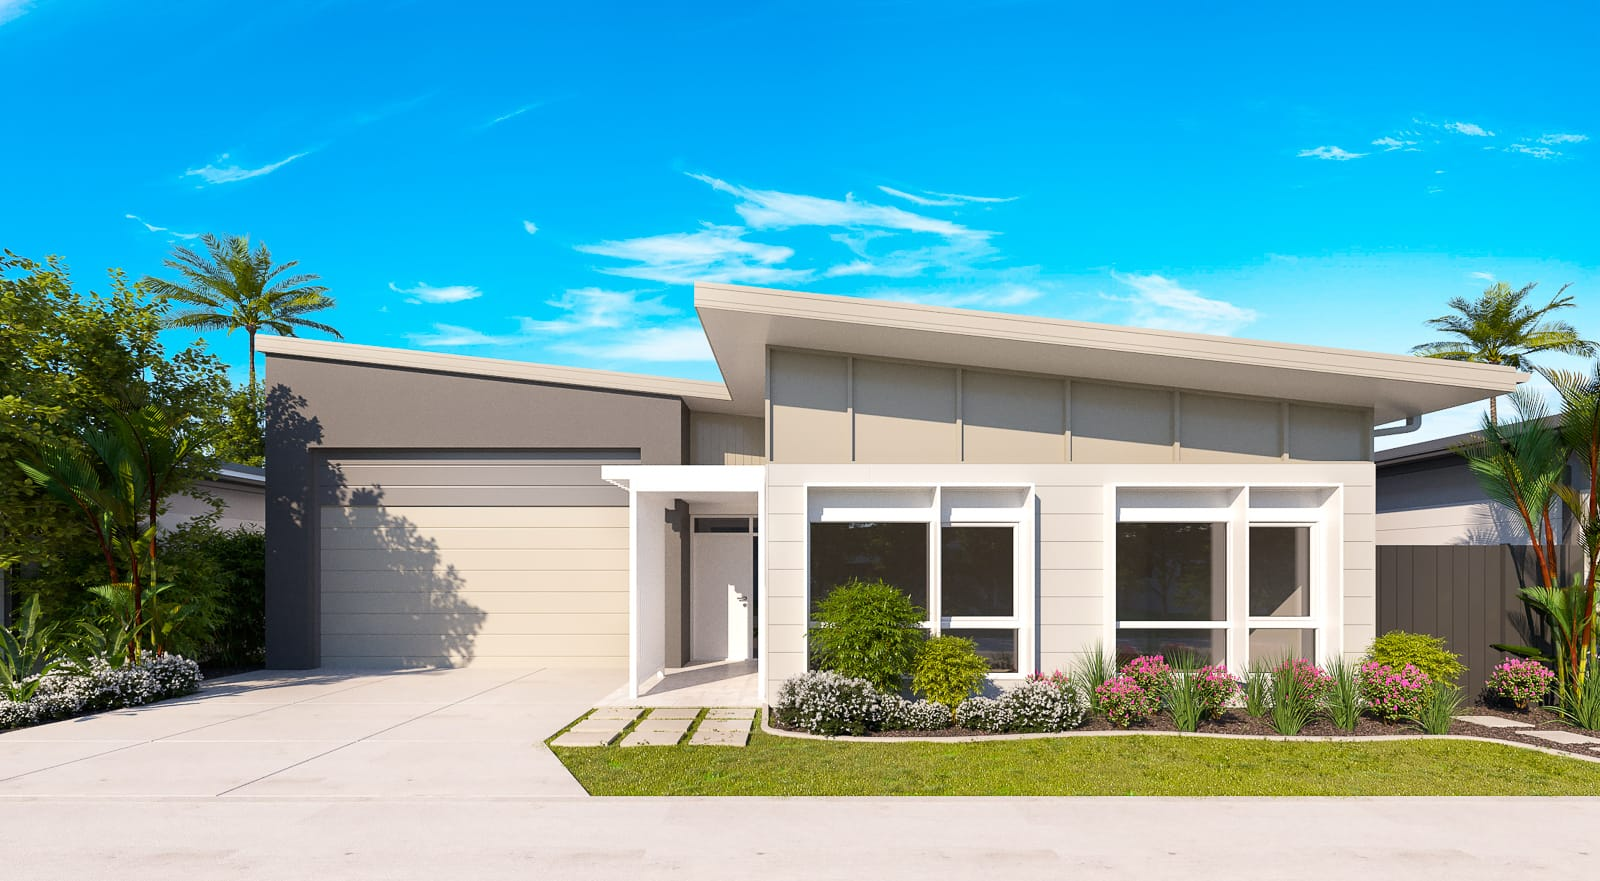 HR WEB L25 House 2B Lot 180 Watson RGB V1 - Lot 180